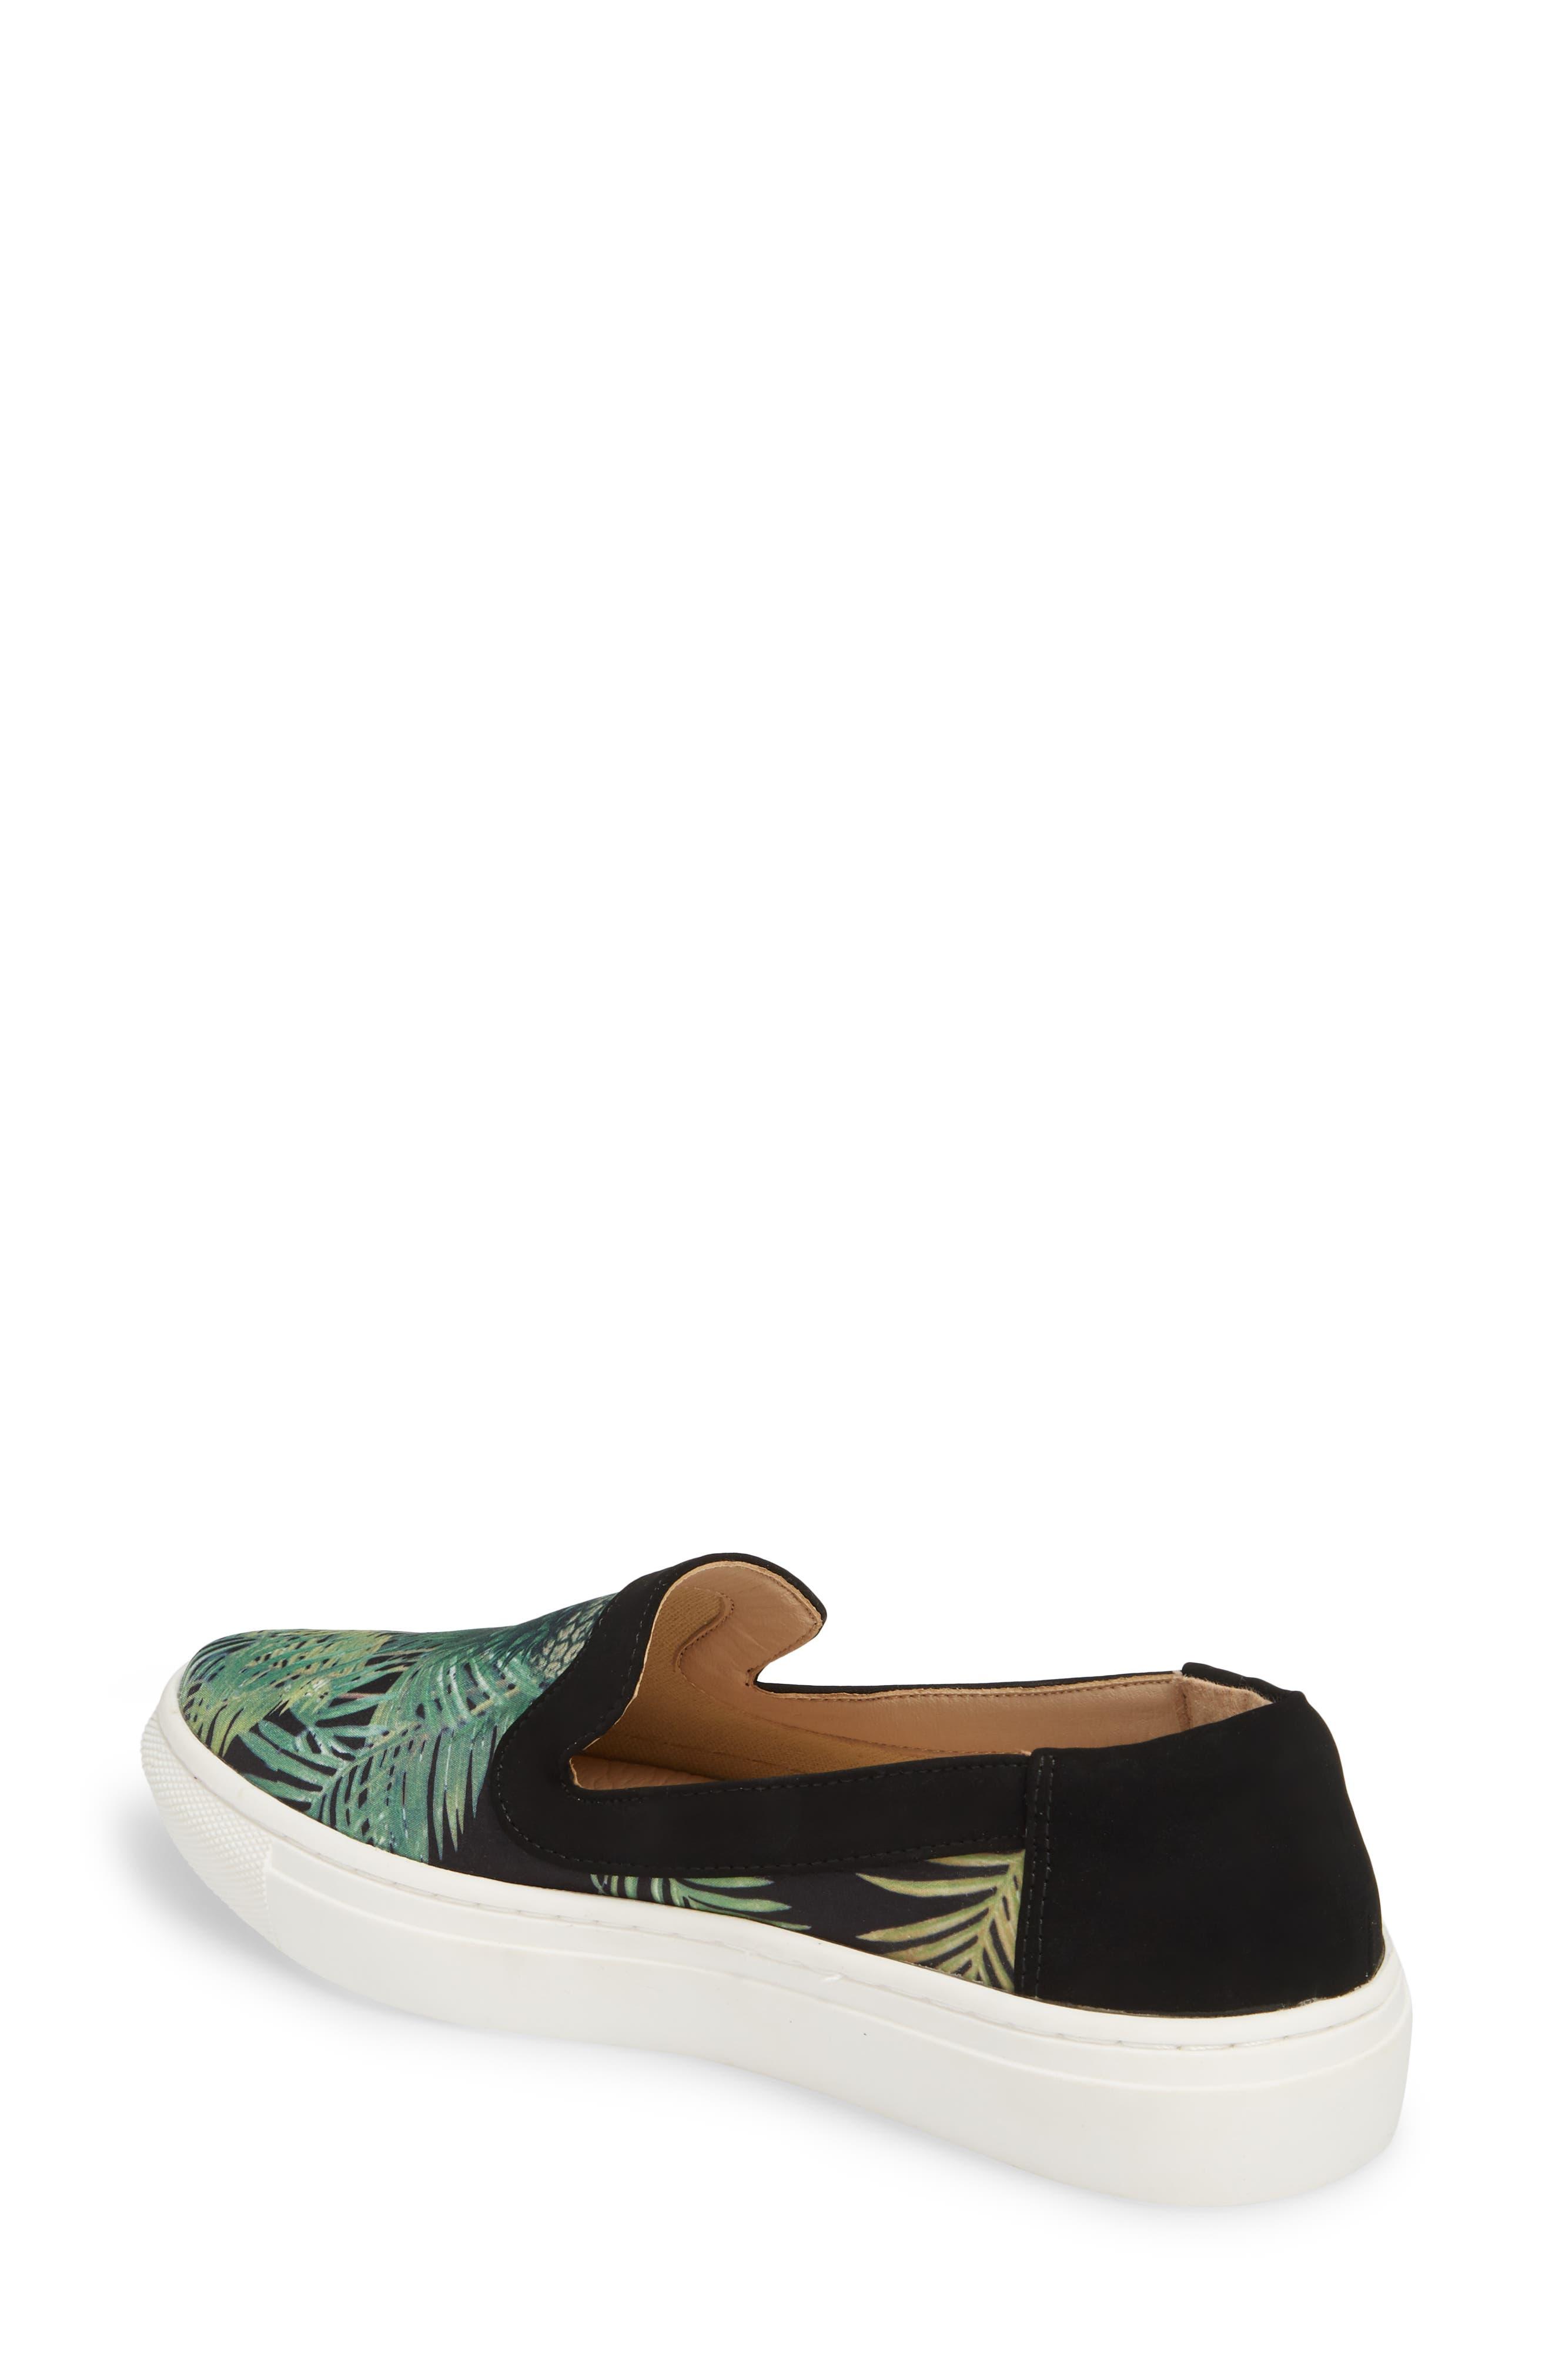 Lineth Sneaker,                             Alternate thumbnail 2, color,                             BLACK / MULTI